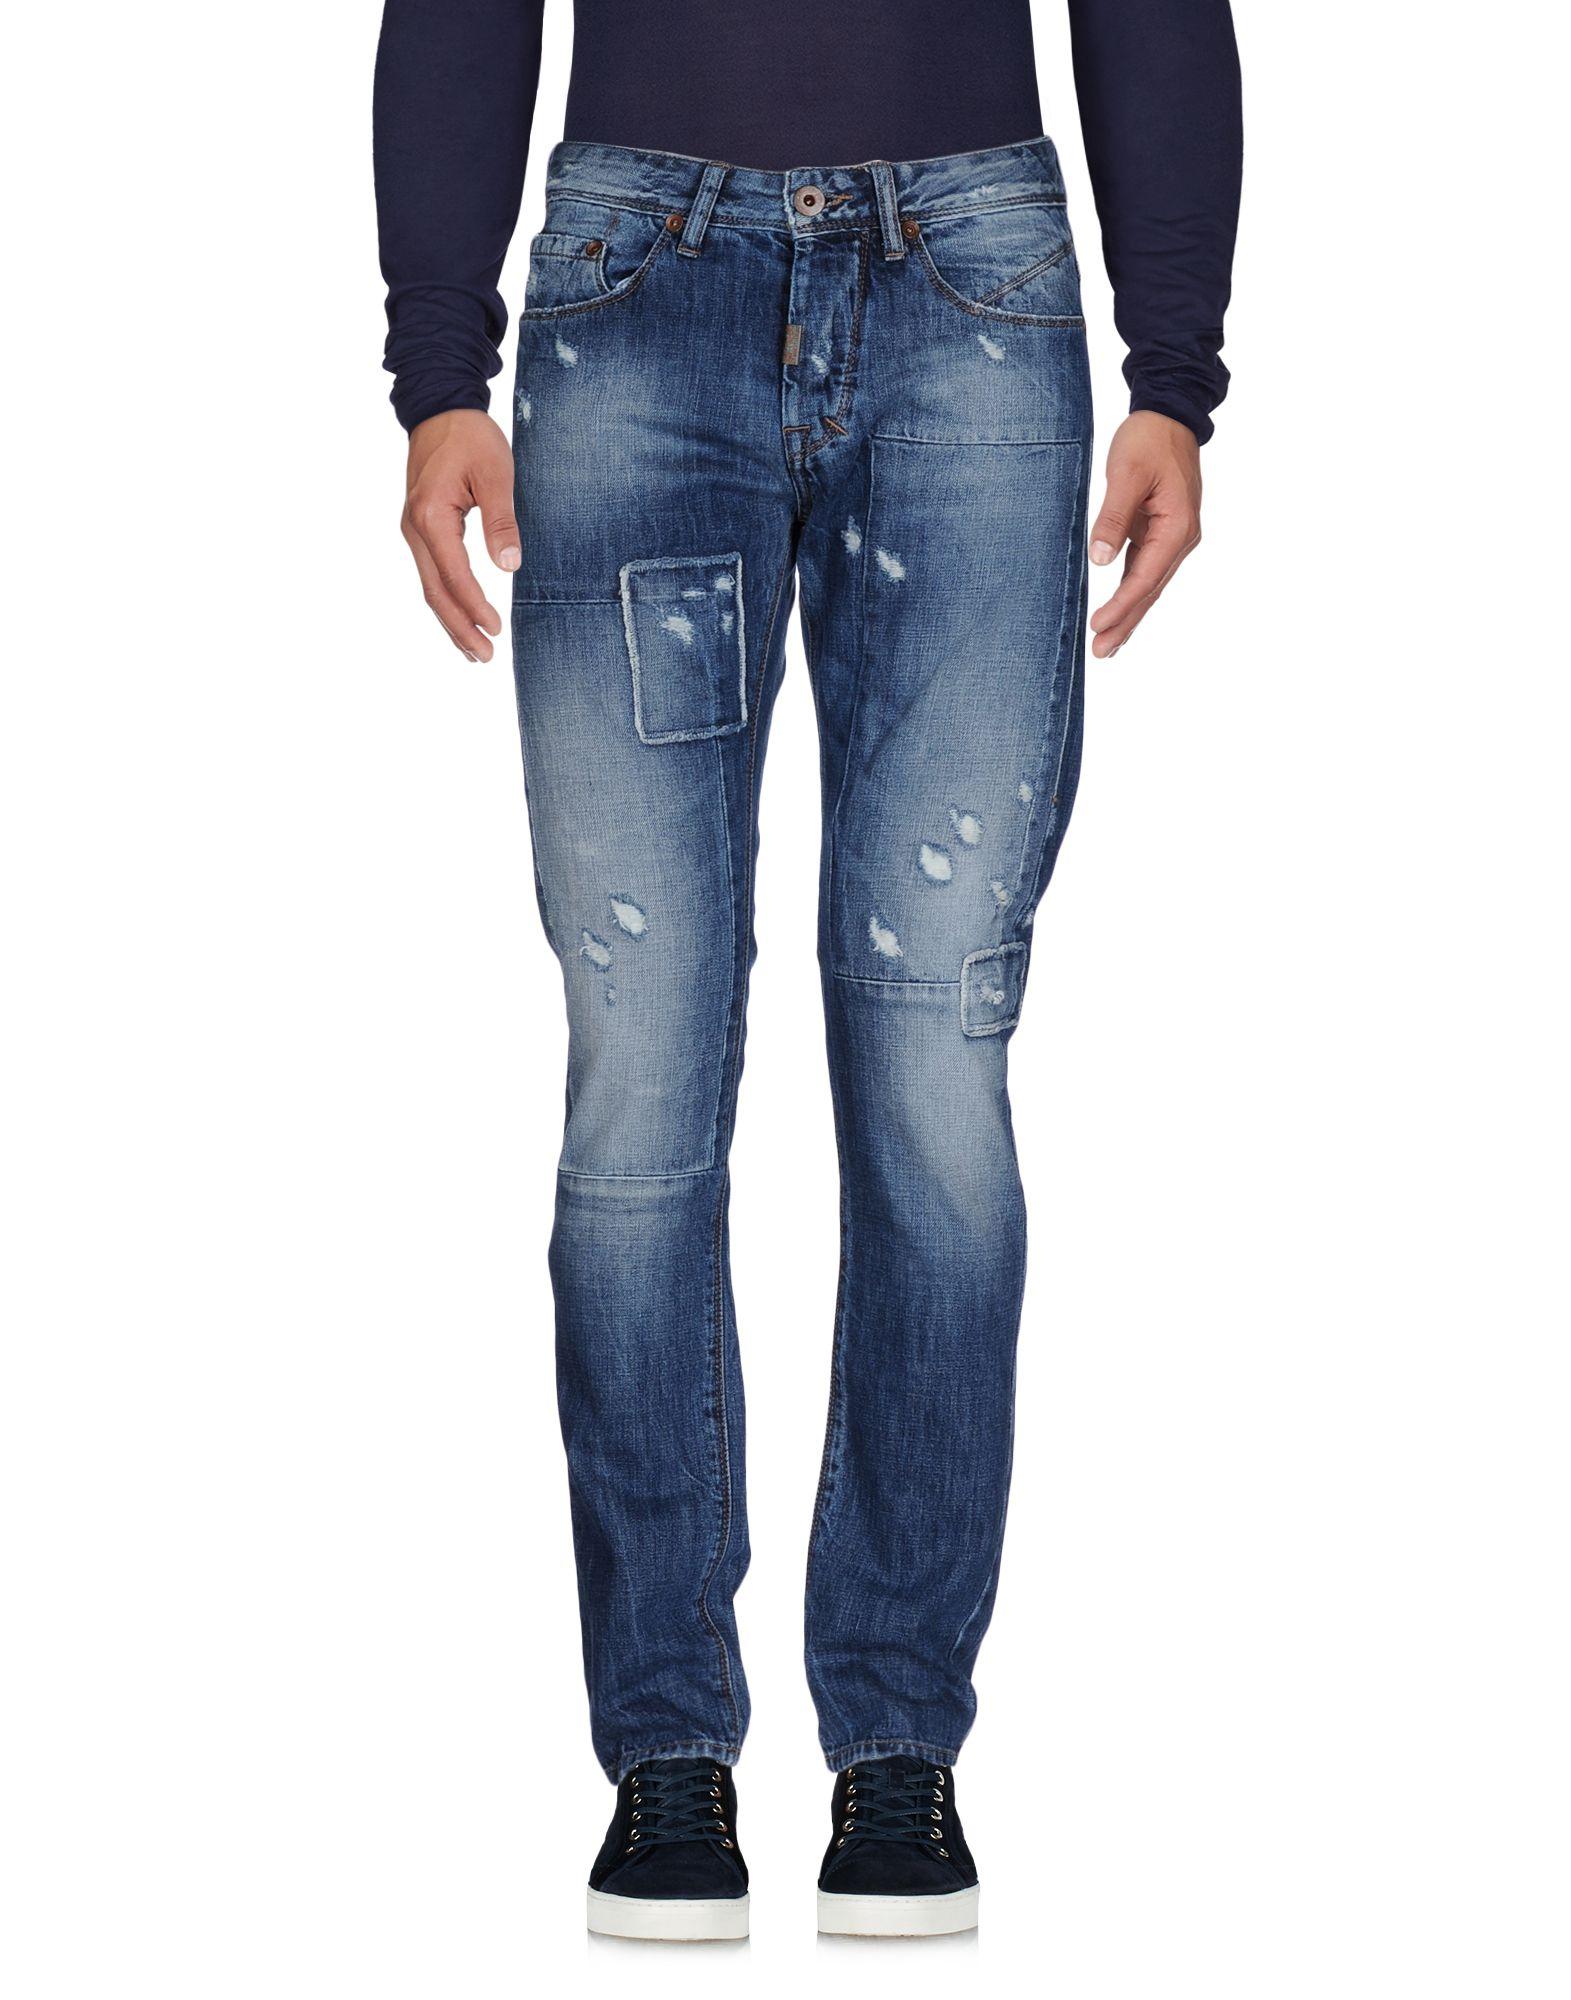 BRAY STEVE ALAN Джинсовые брюки цена